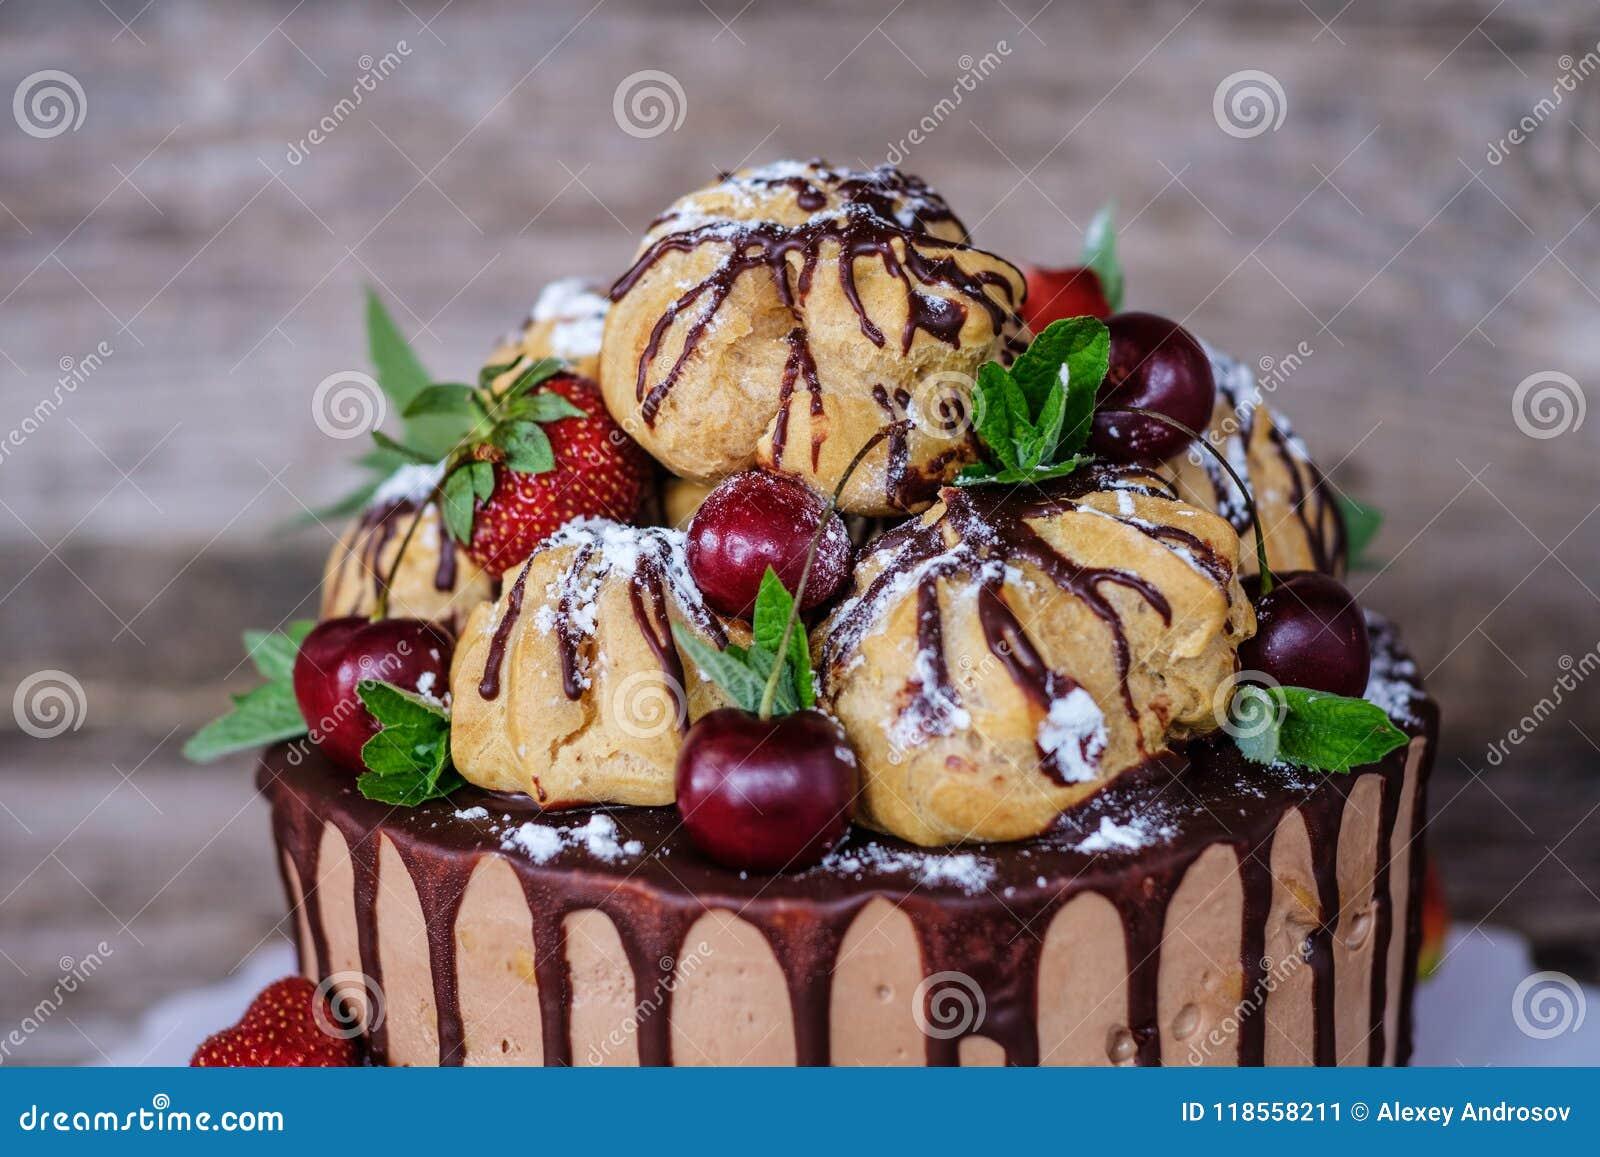 Homemade profiterole cake with strawberries and cherries